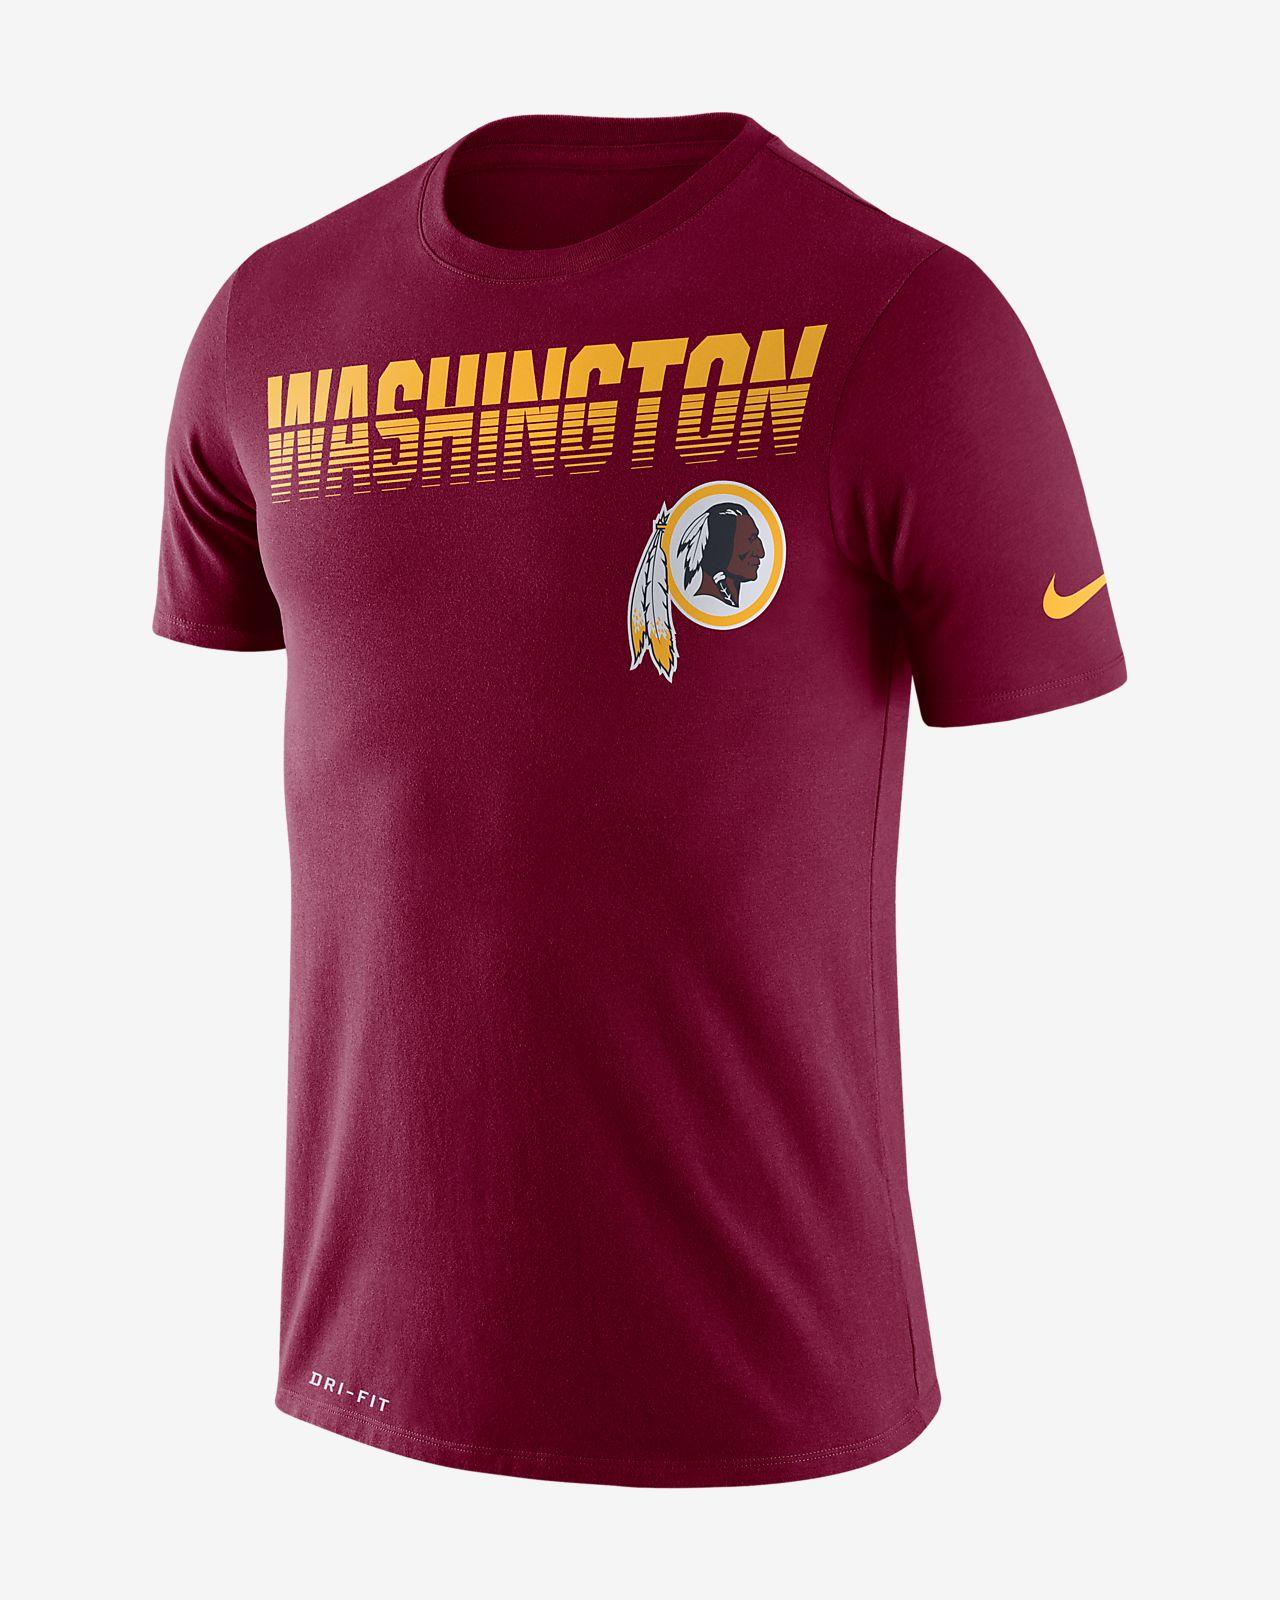 66c25e13 Nike Legend (NFL Redskins) Men's Short-Sleeve T-Shirt